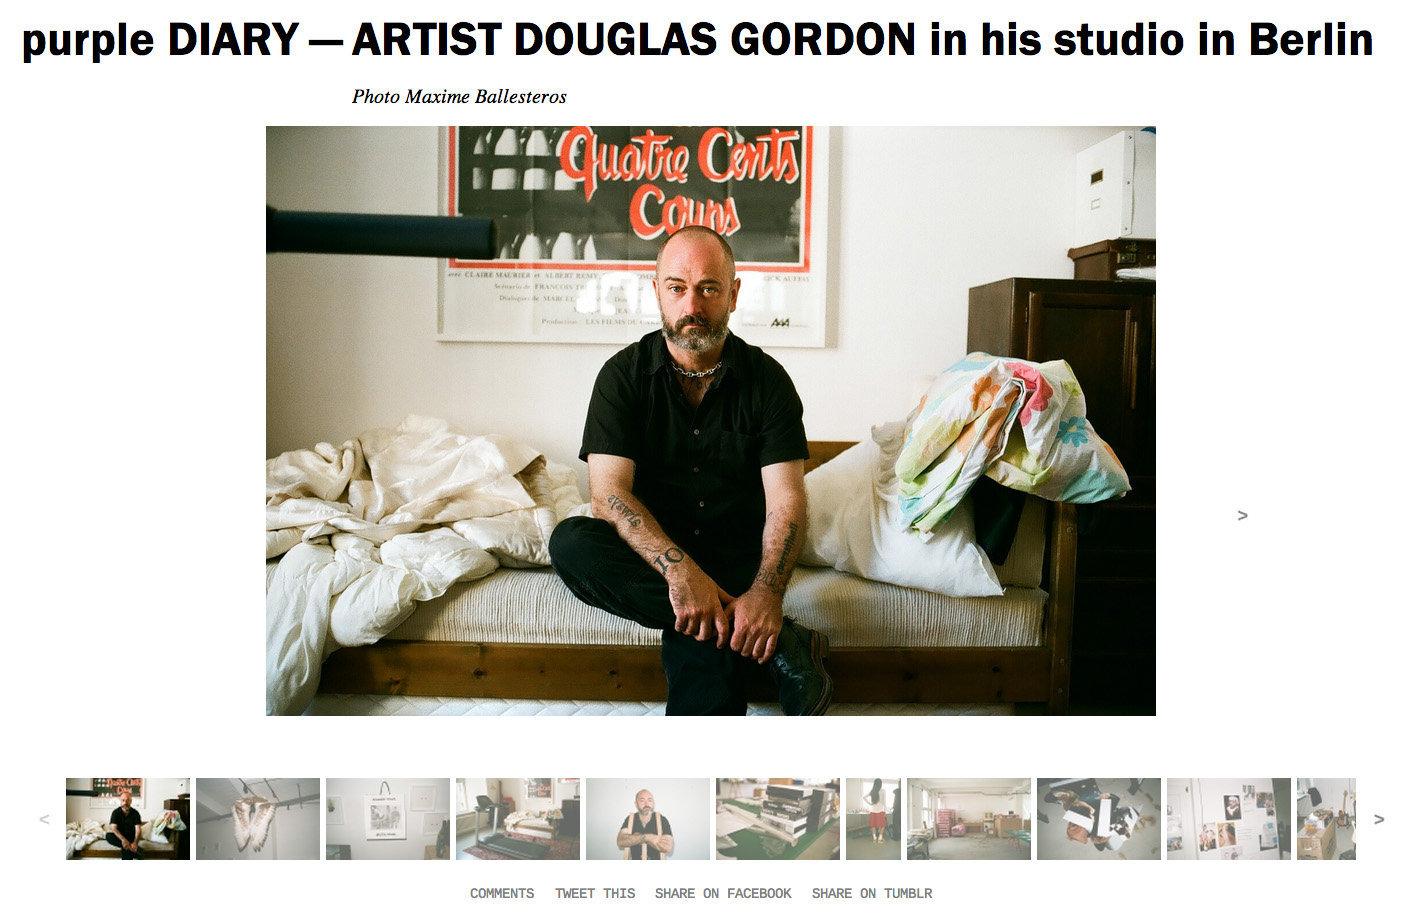 purple DIARY   ARTIST DOUGLAS GORDON in his studio in Berlin.jpg